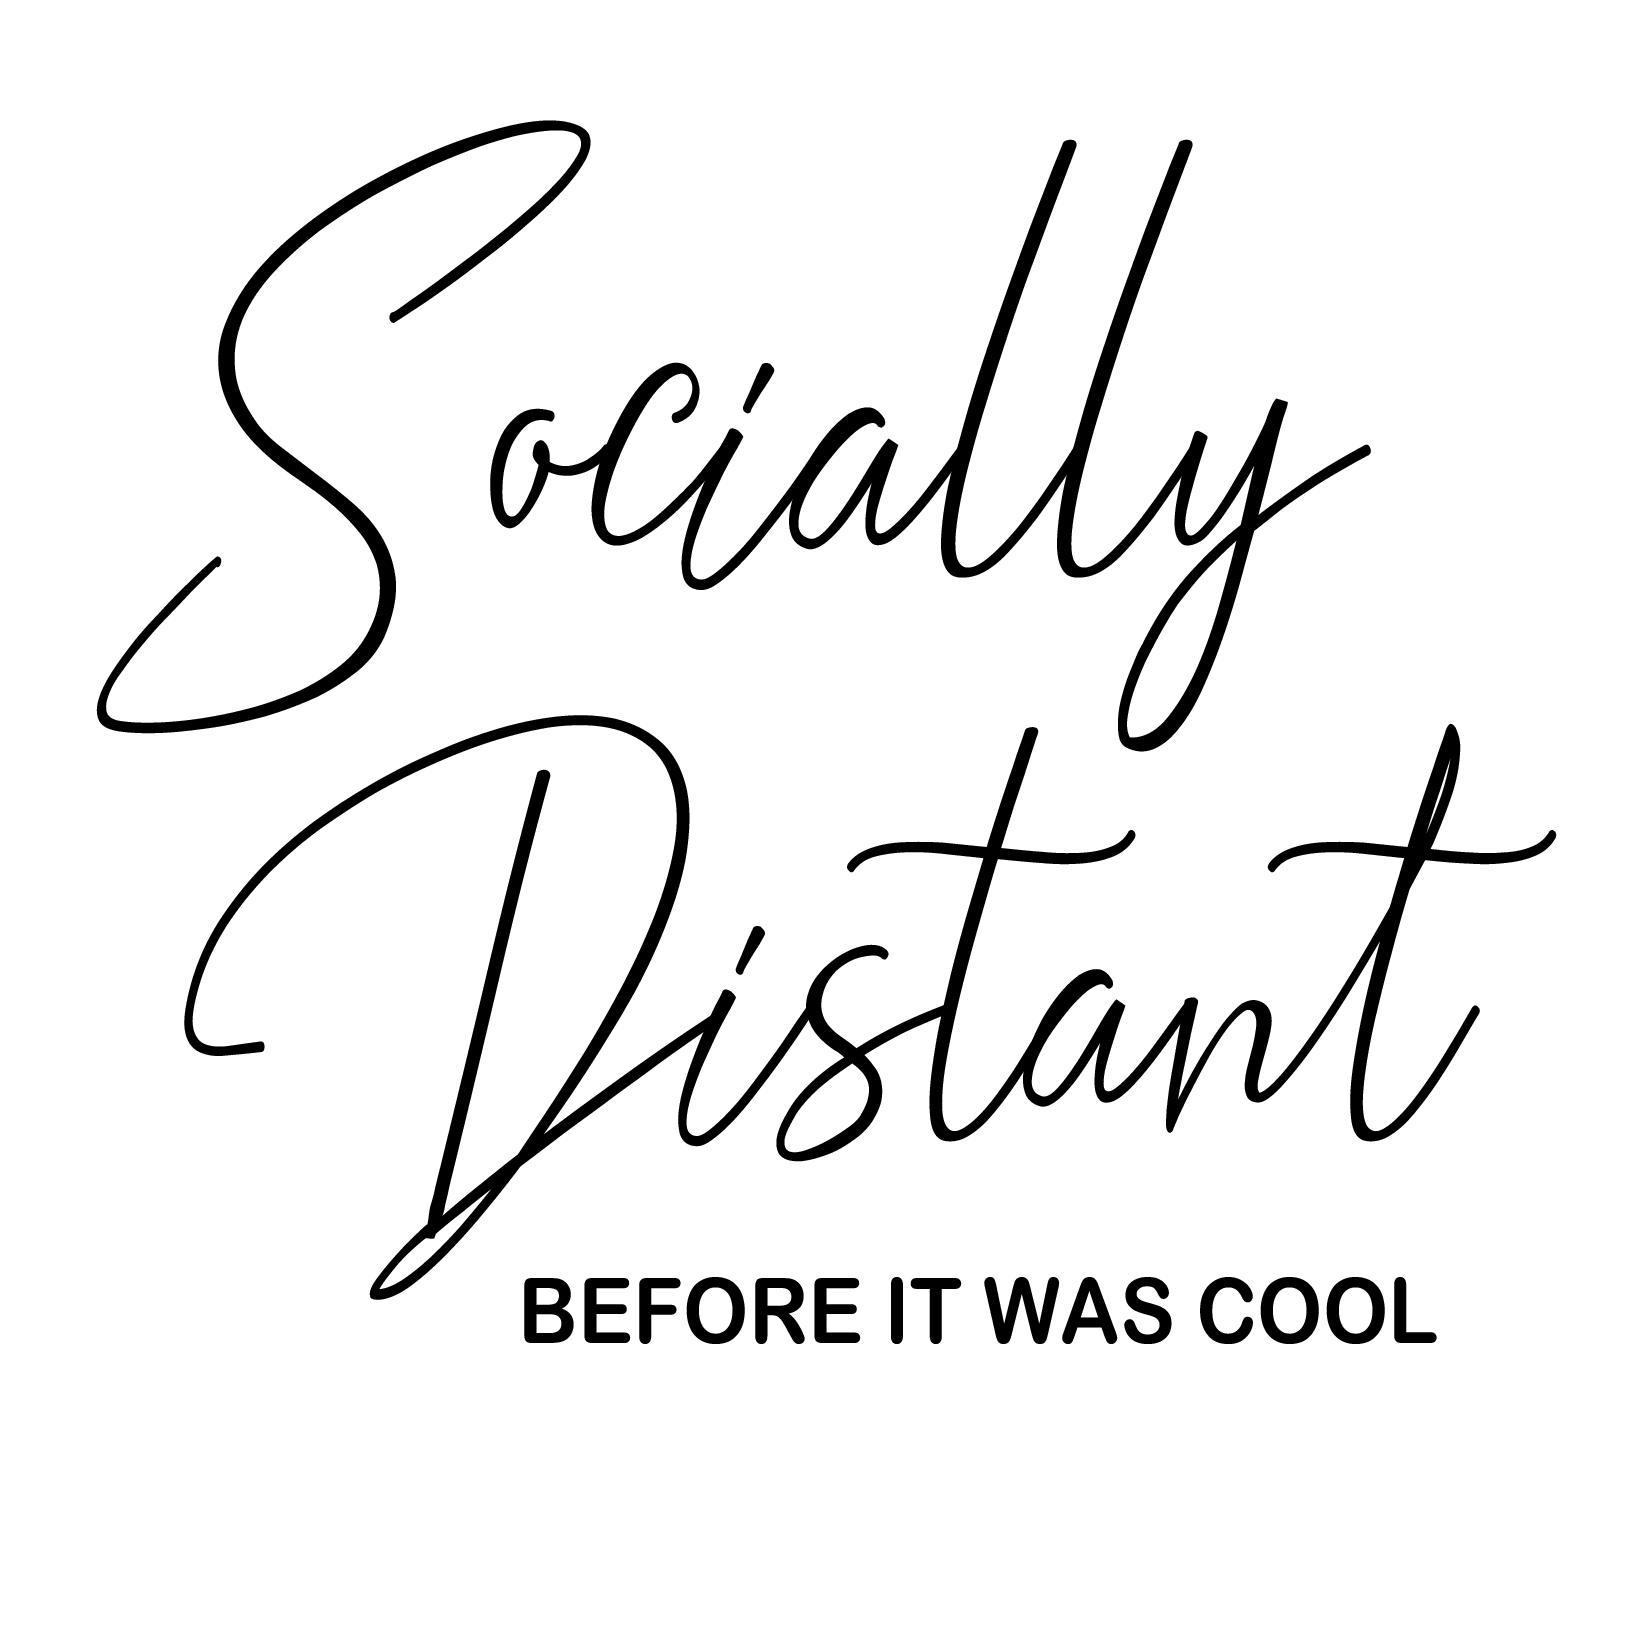 Socially Distant